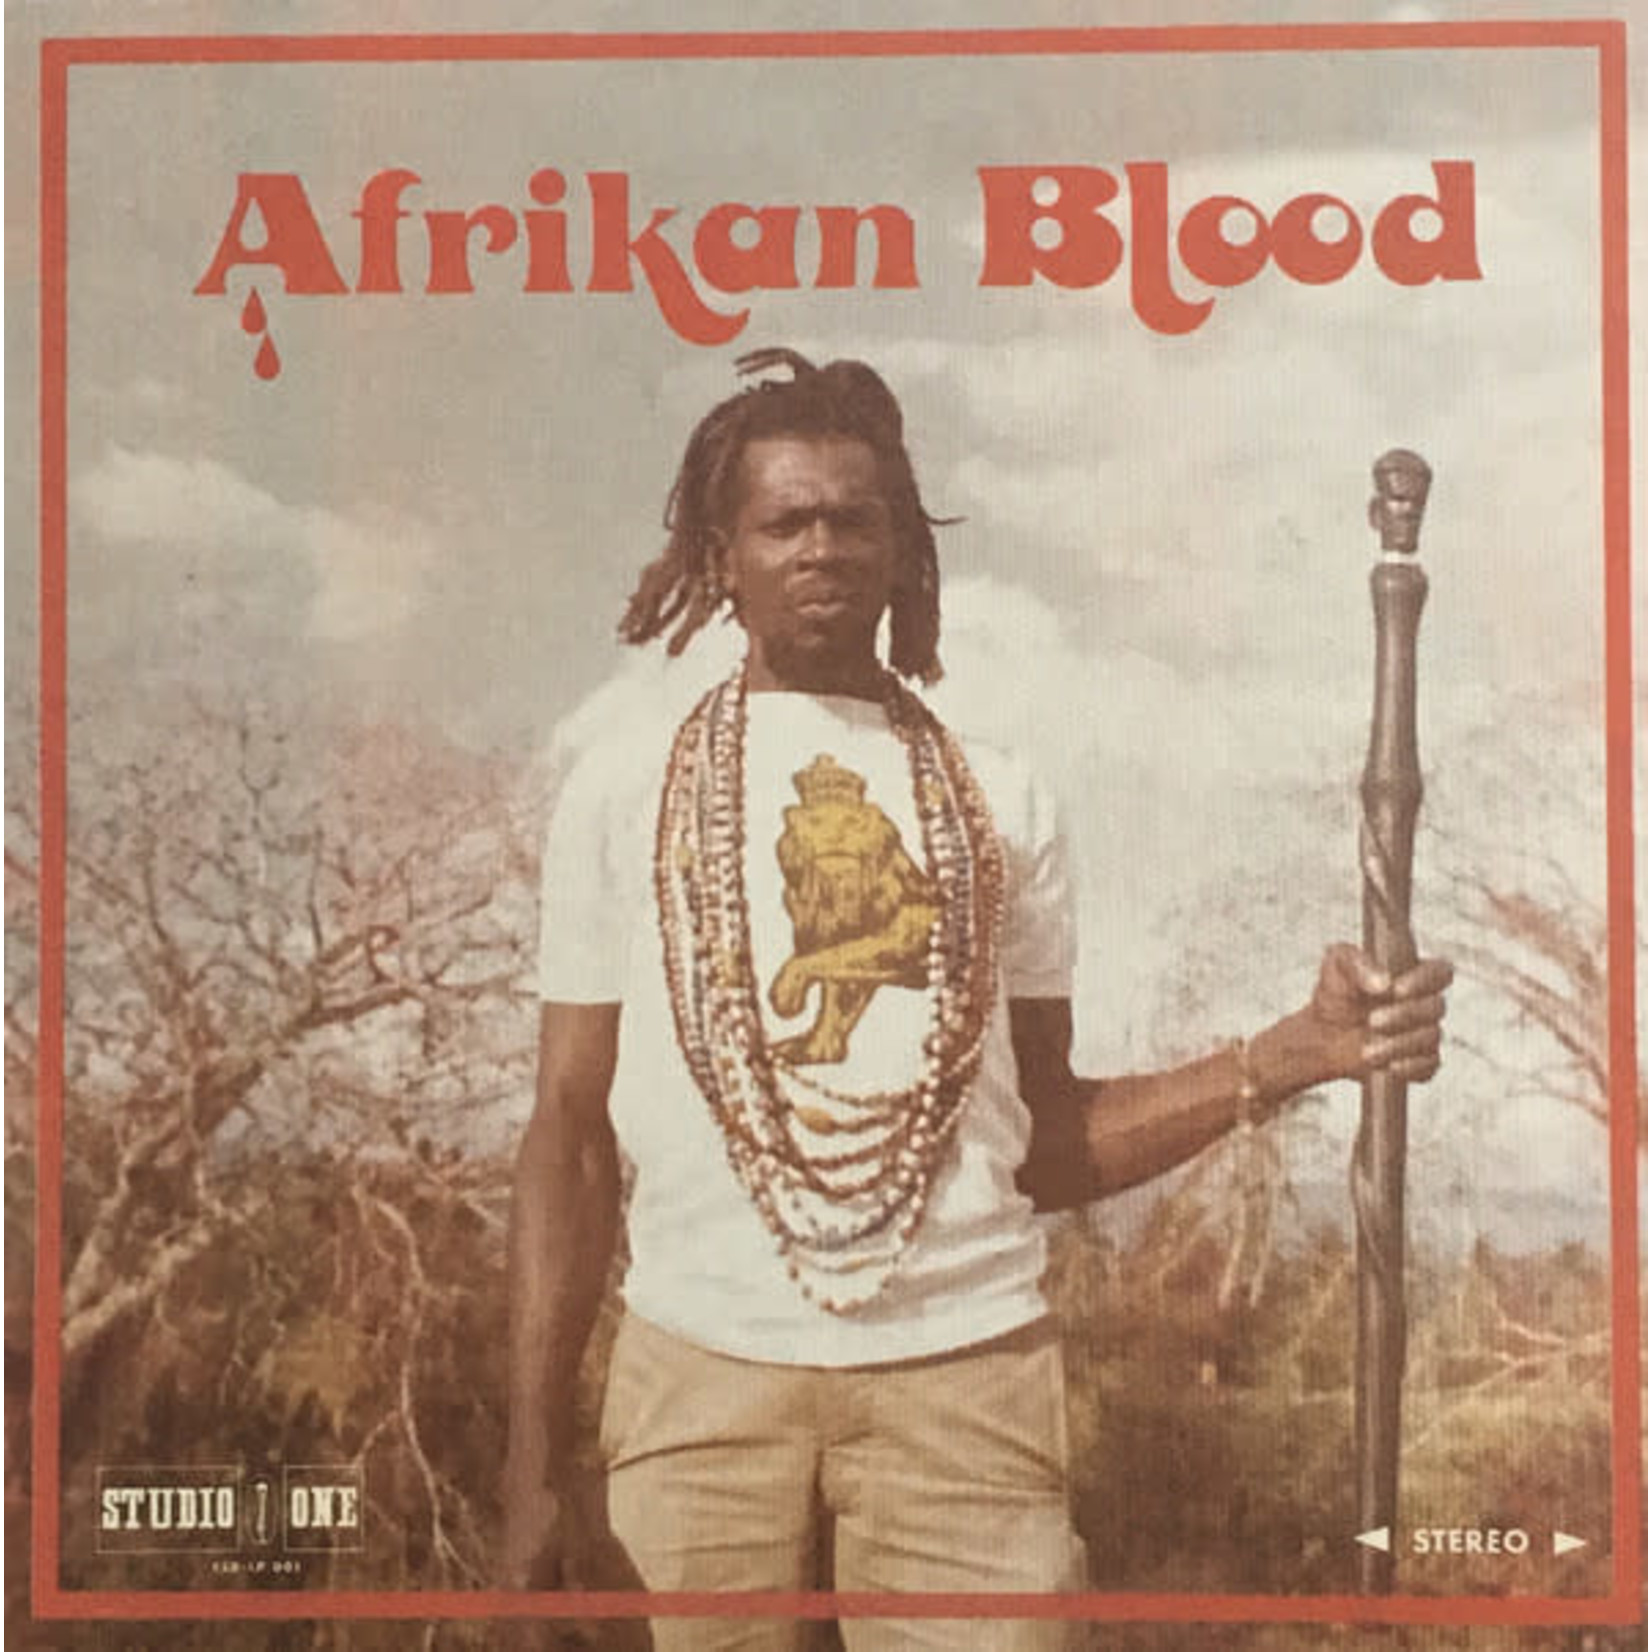 STUDIO ONE BF 2020 - AFRIKAN BLOOD